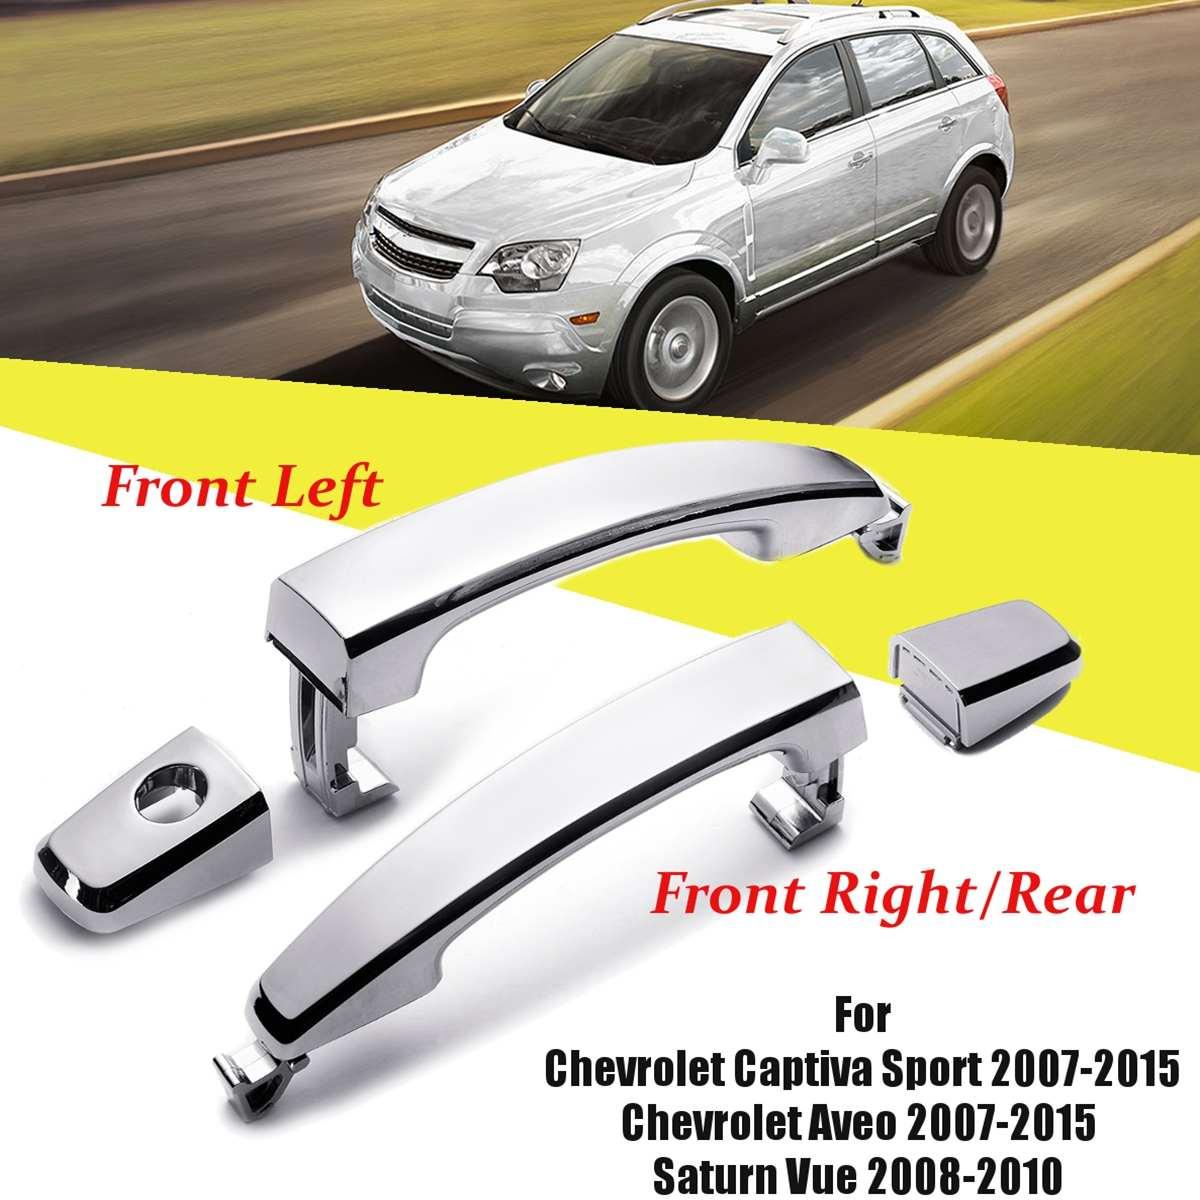 Sizver Chrome Door Handle Covers For 2007-2010 Saturn Outlook